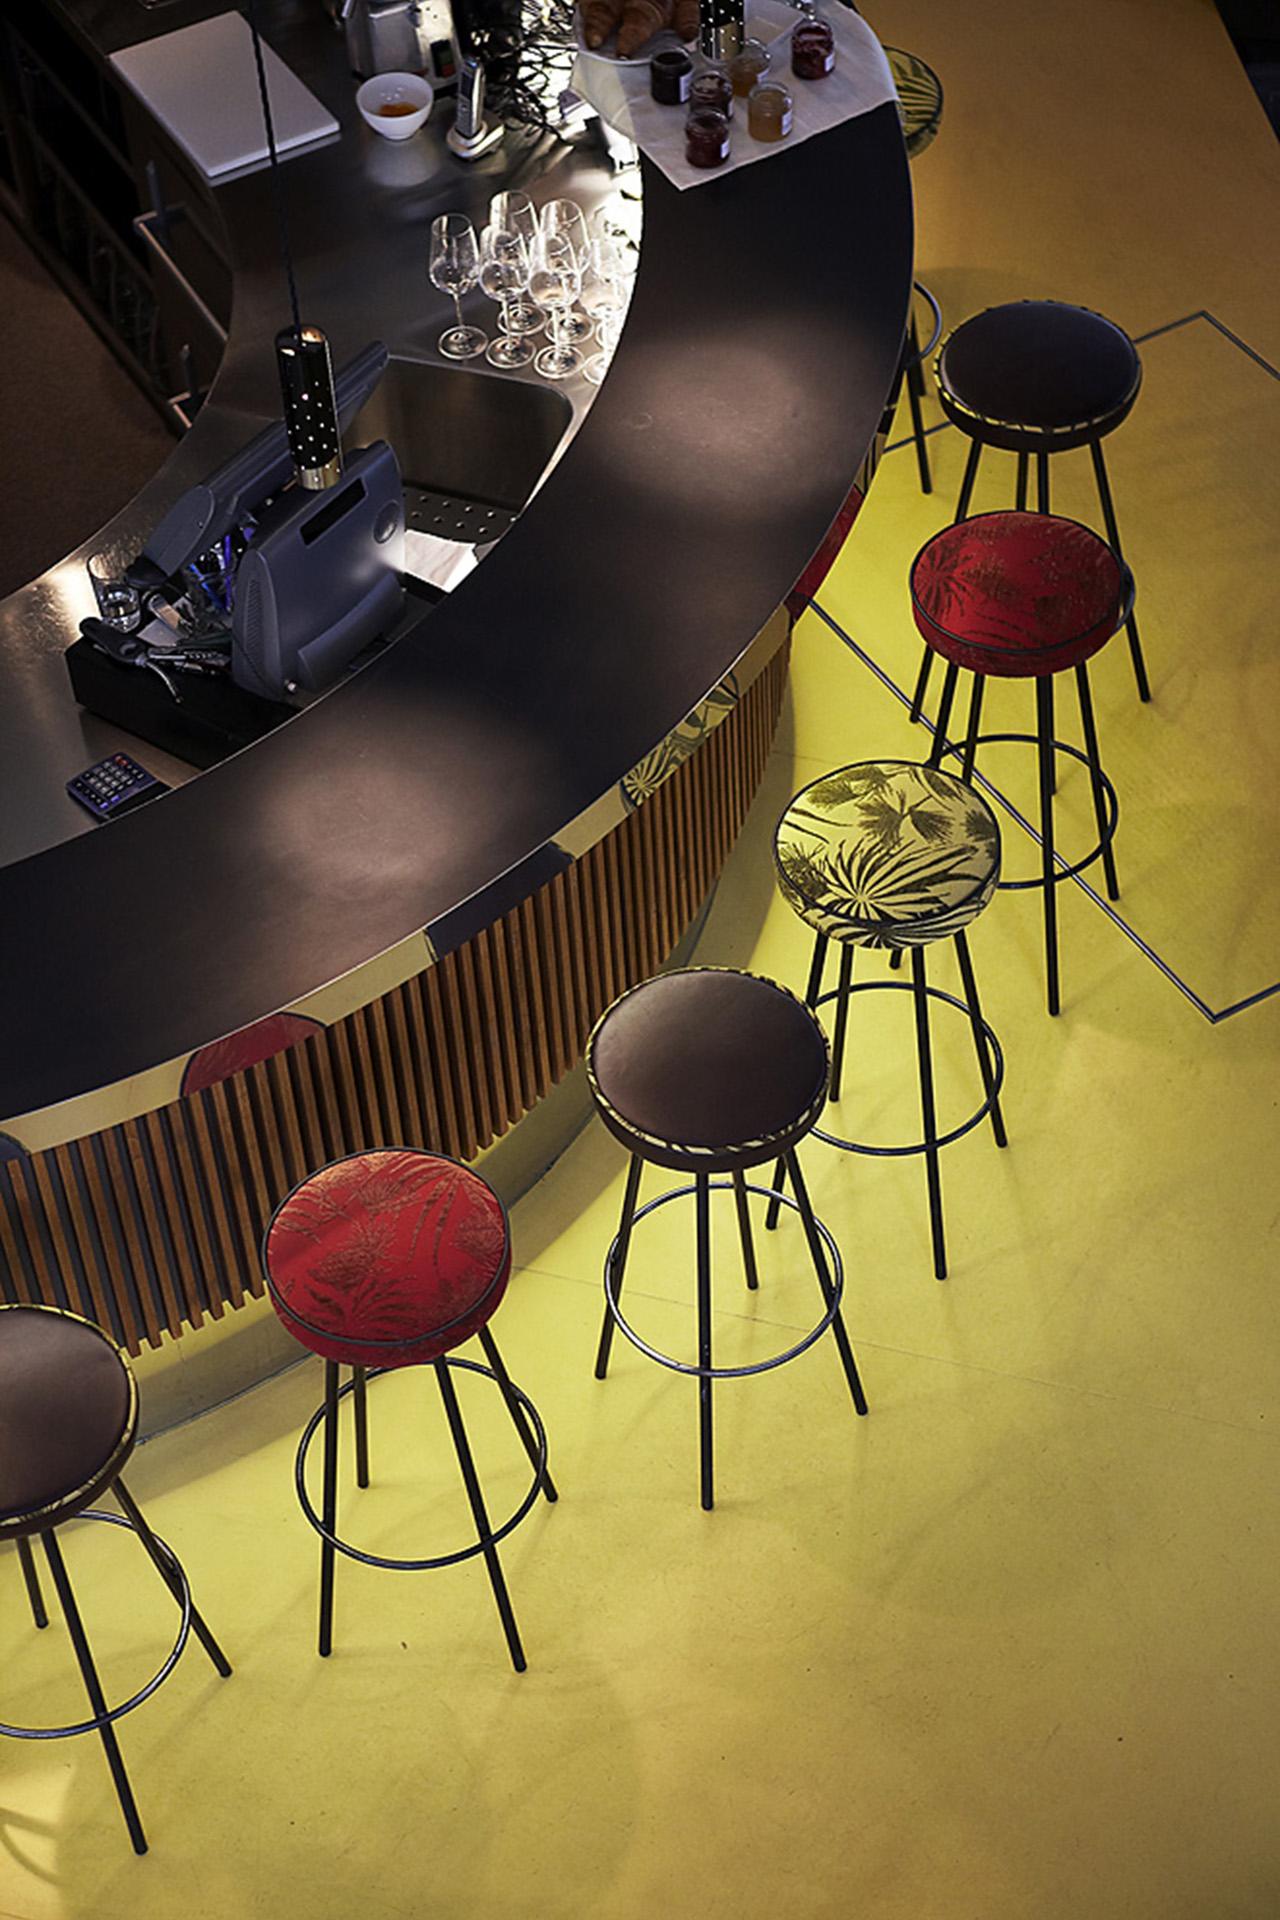 021-interior-design-hospitality-cafe-restaurant-glockenbach-muenchen-buero-philipp-moeller.jpg